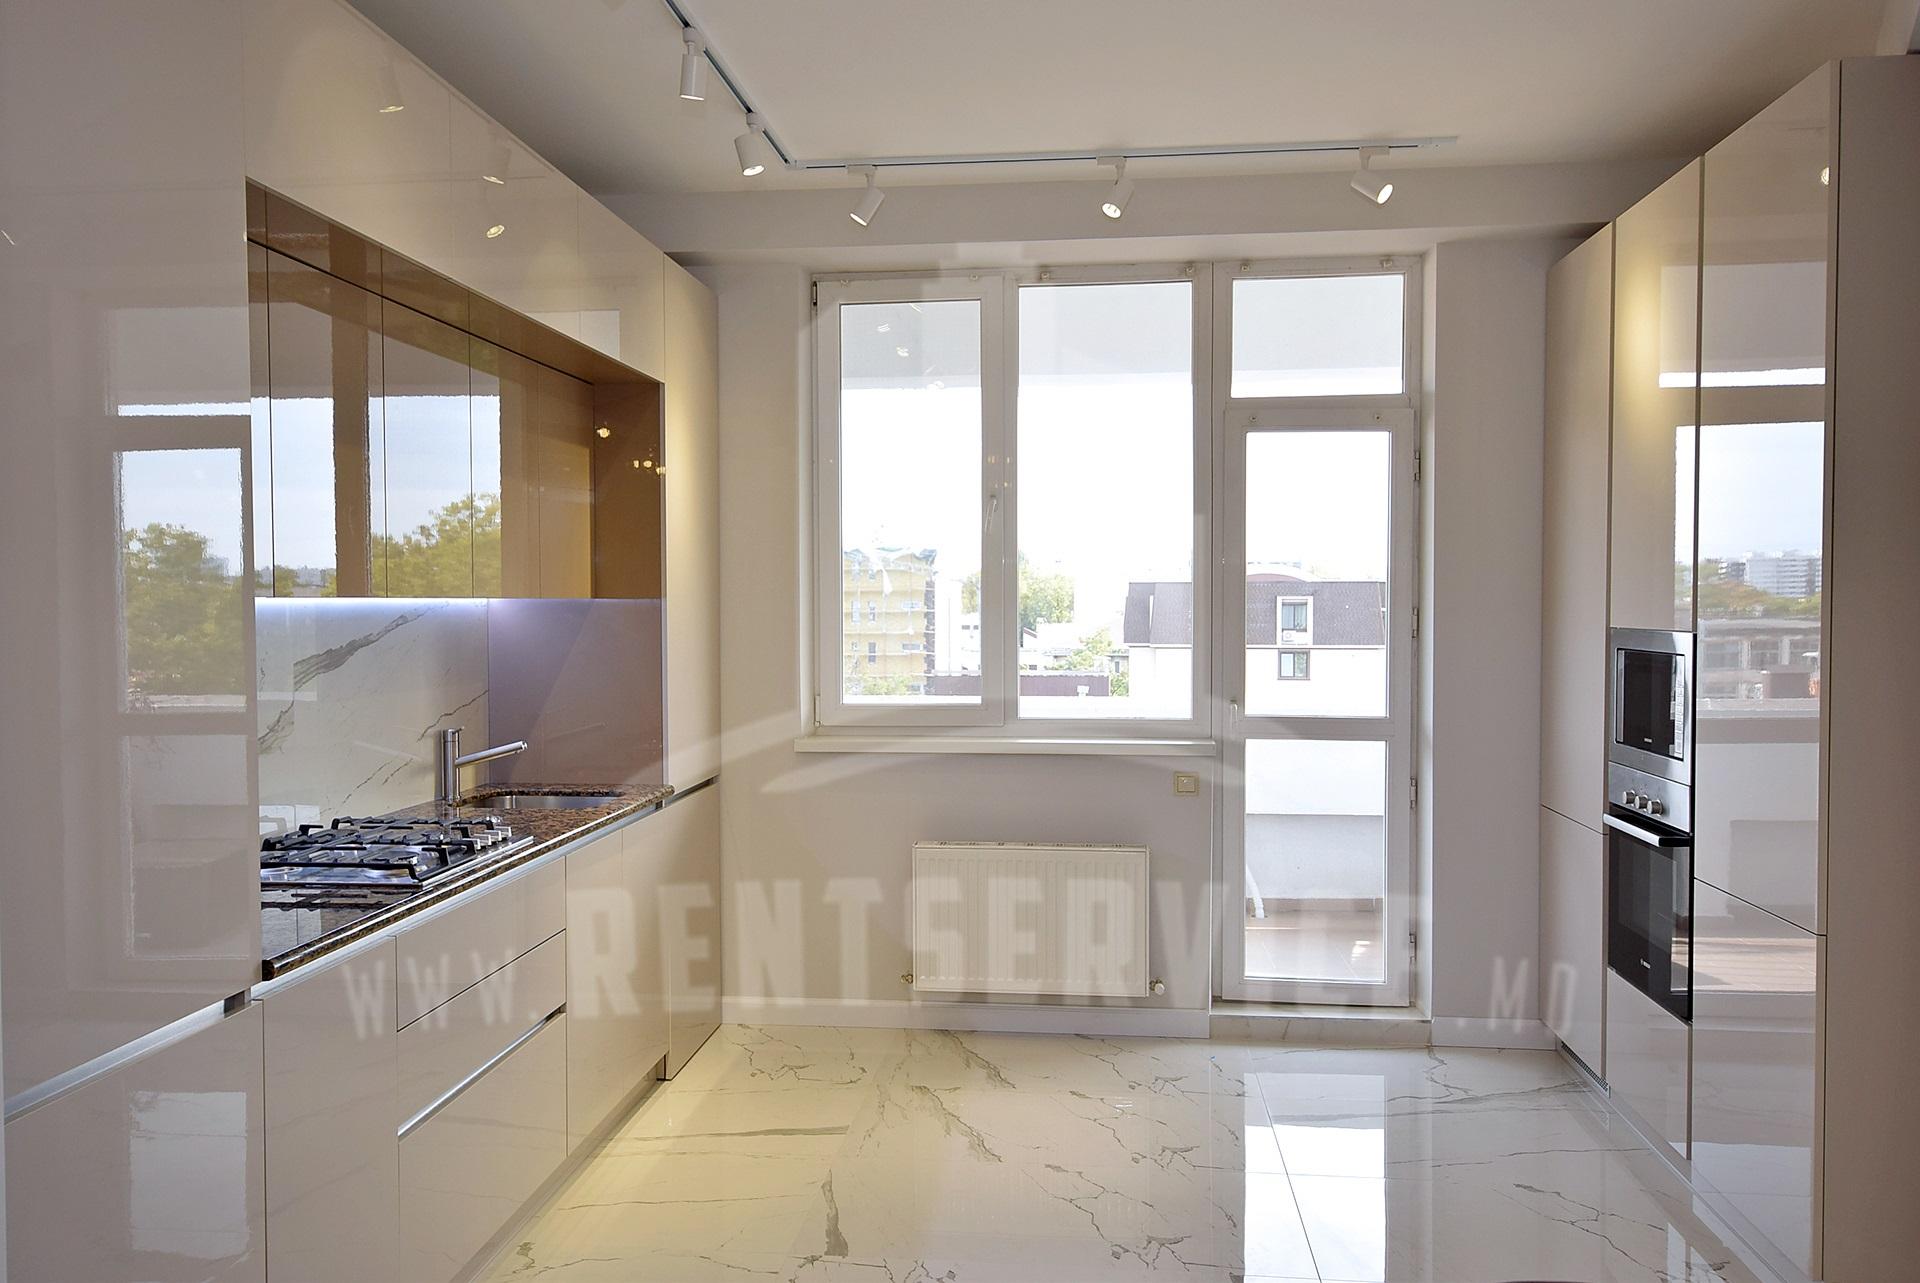 285_apartment_3.JPG